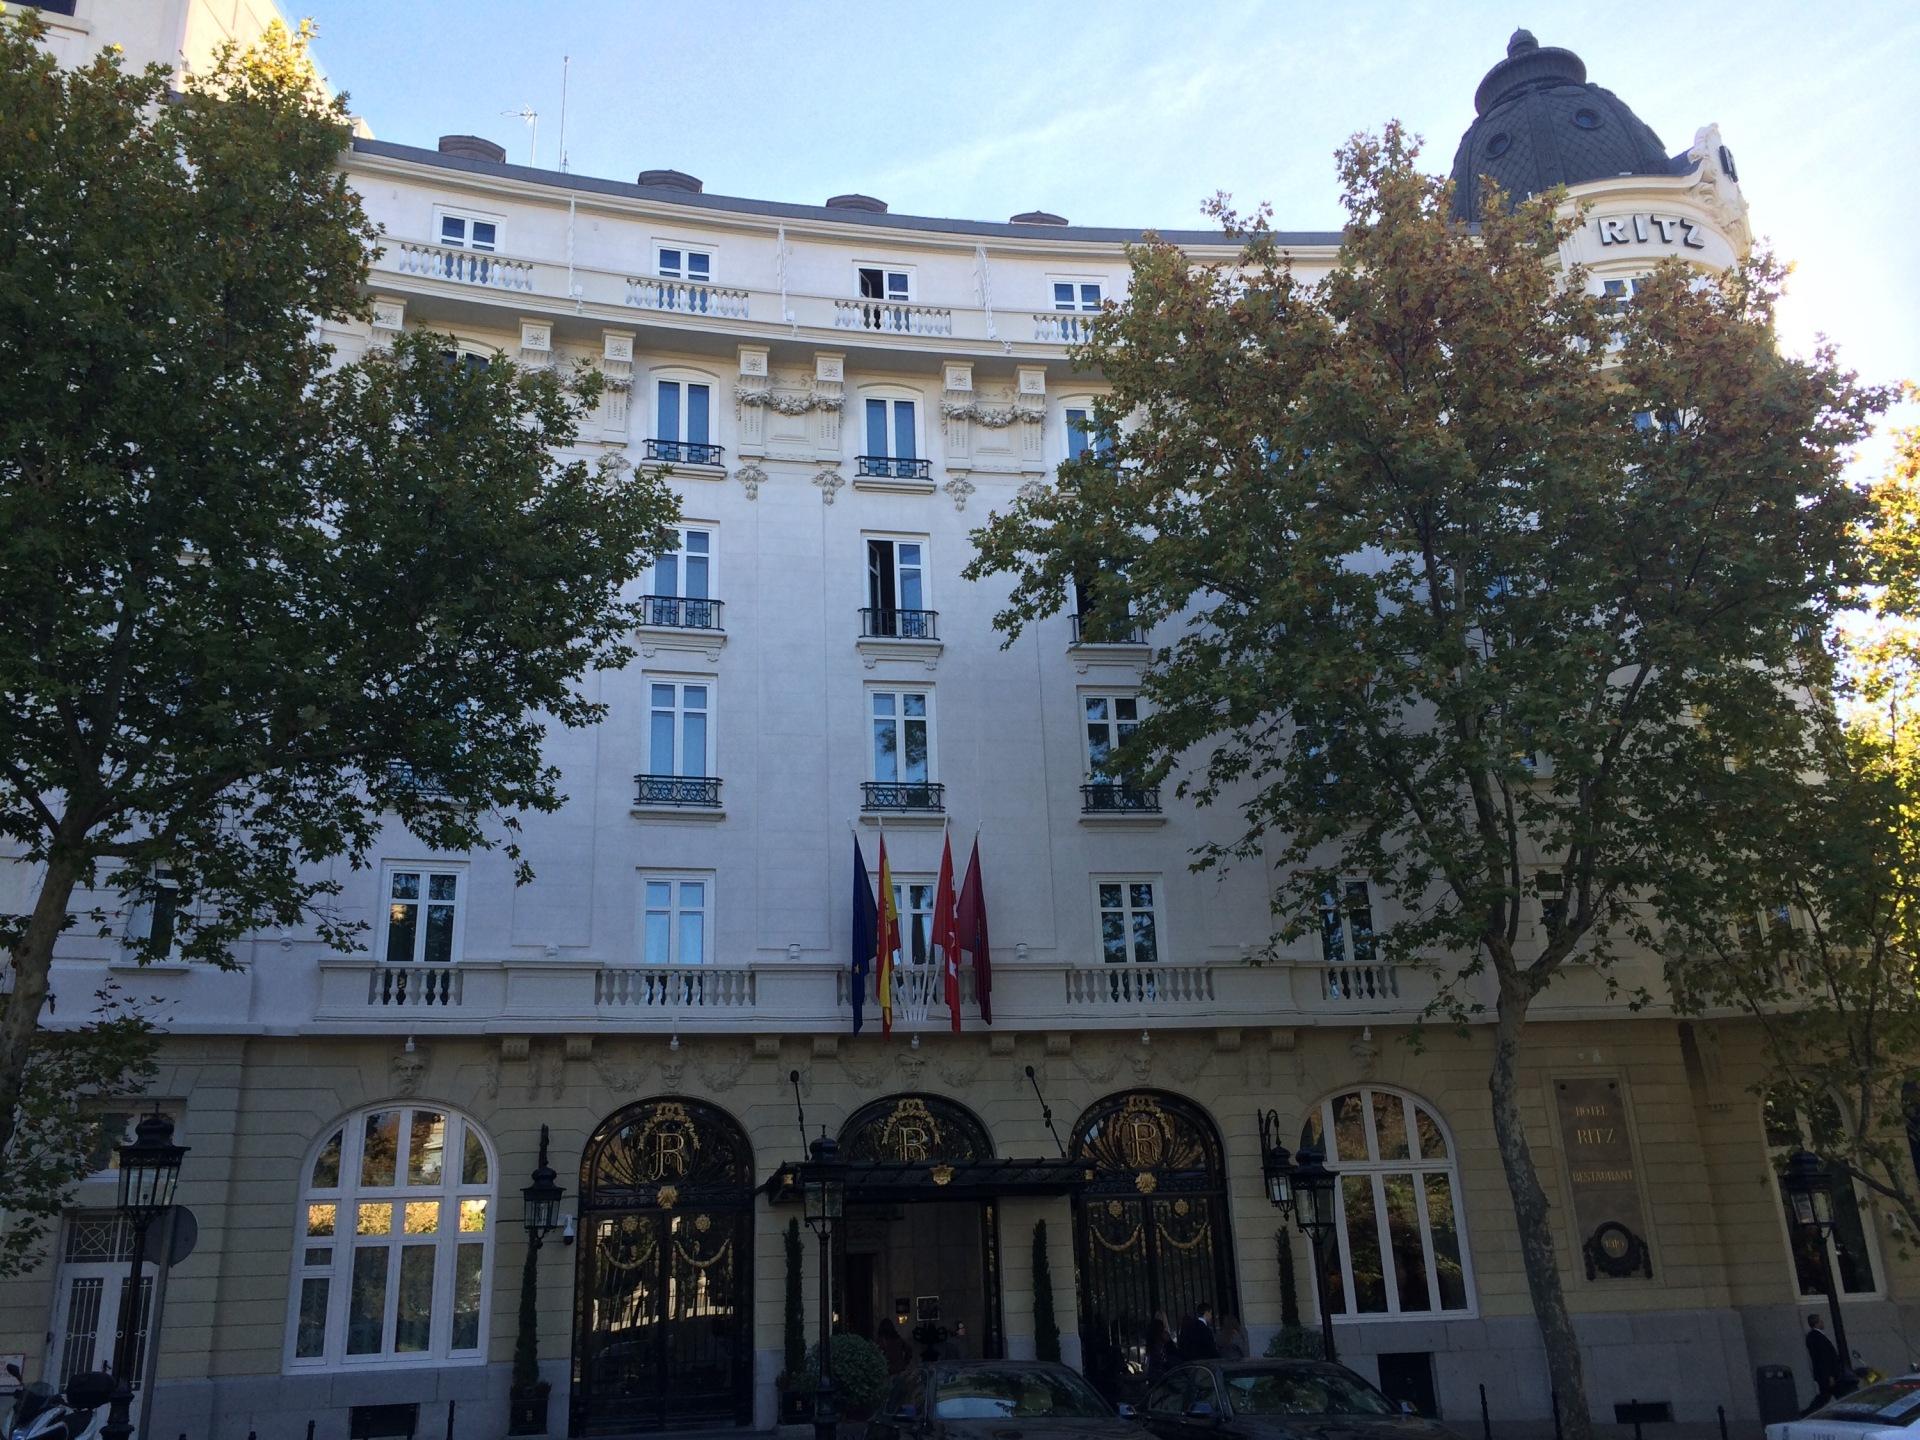 Vista frontal del Hotel Ritz de Madrid